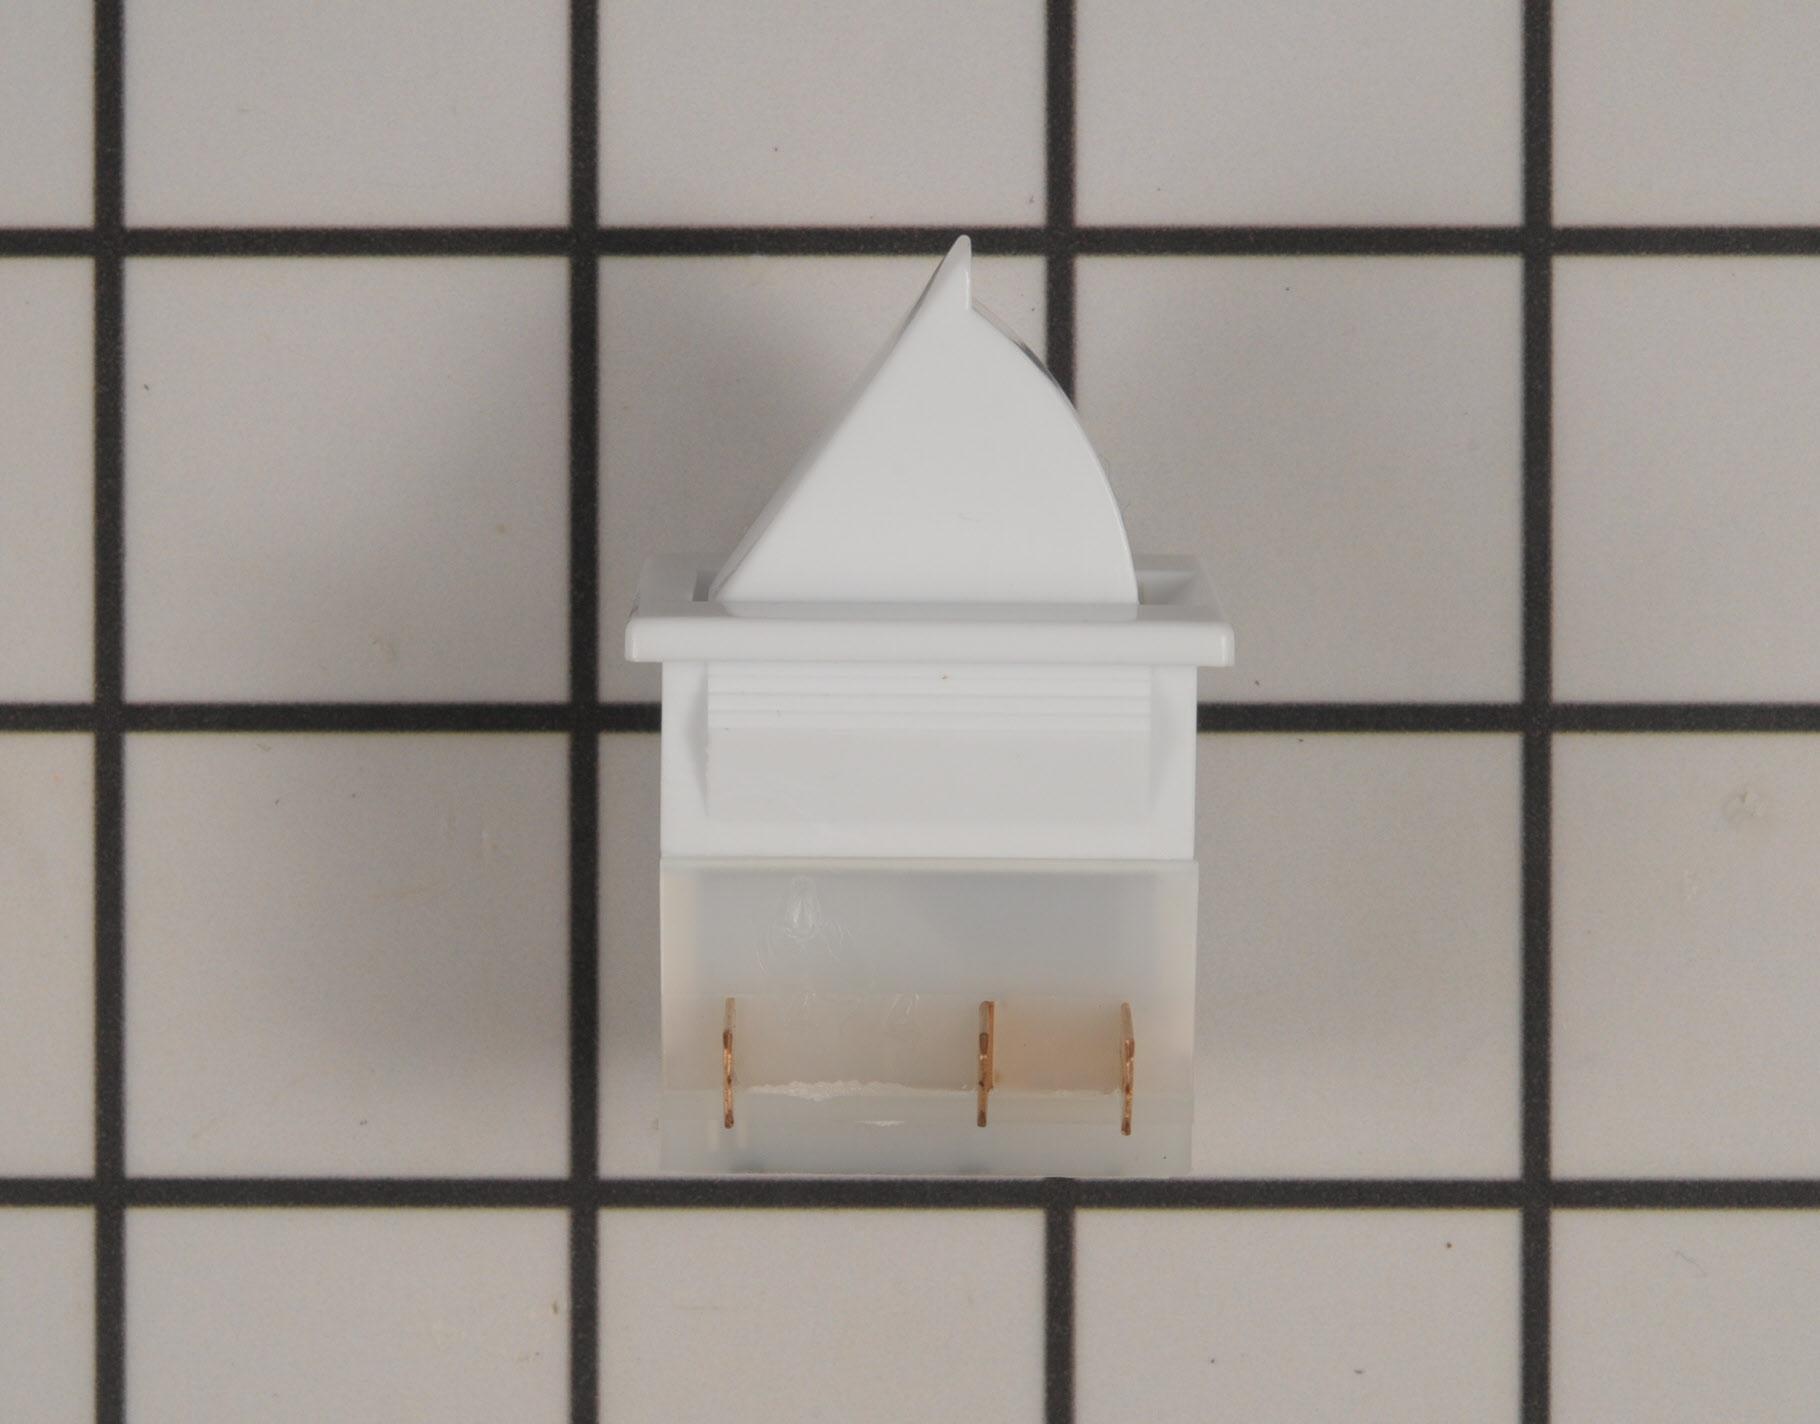 Maytag Refrigerator Part # WP4387911 - Door Switch